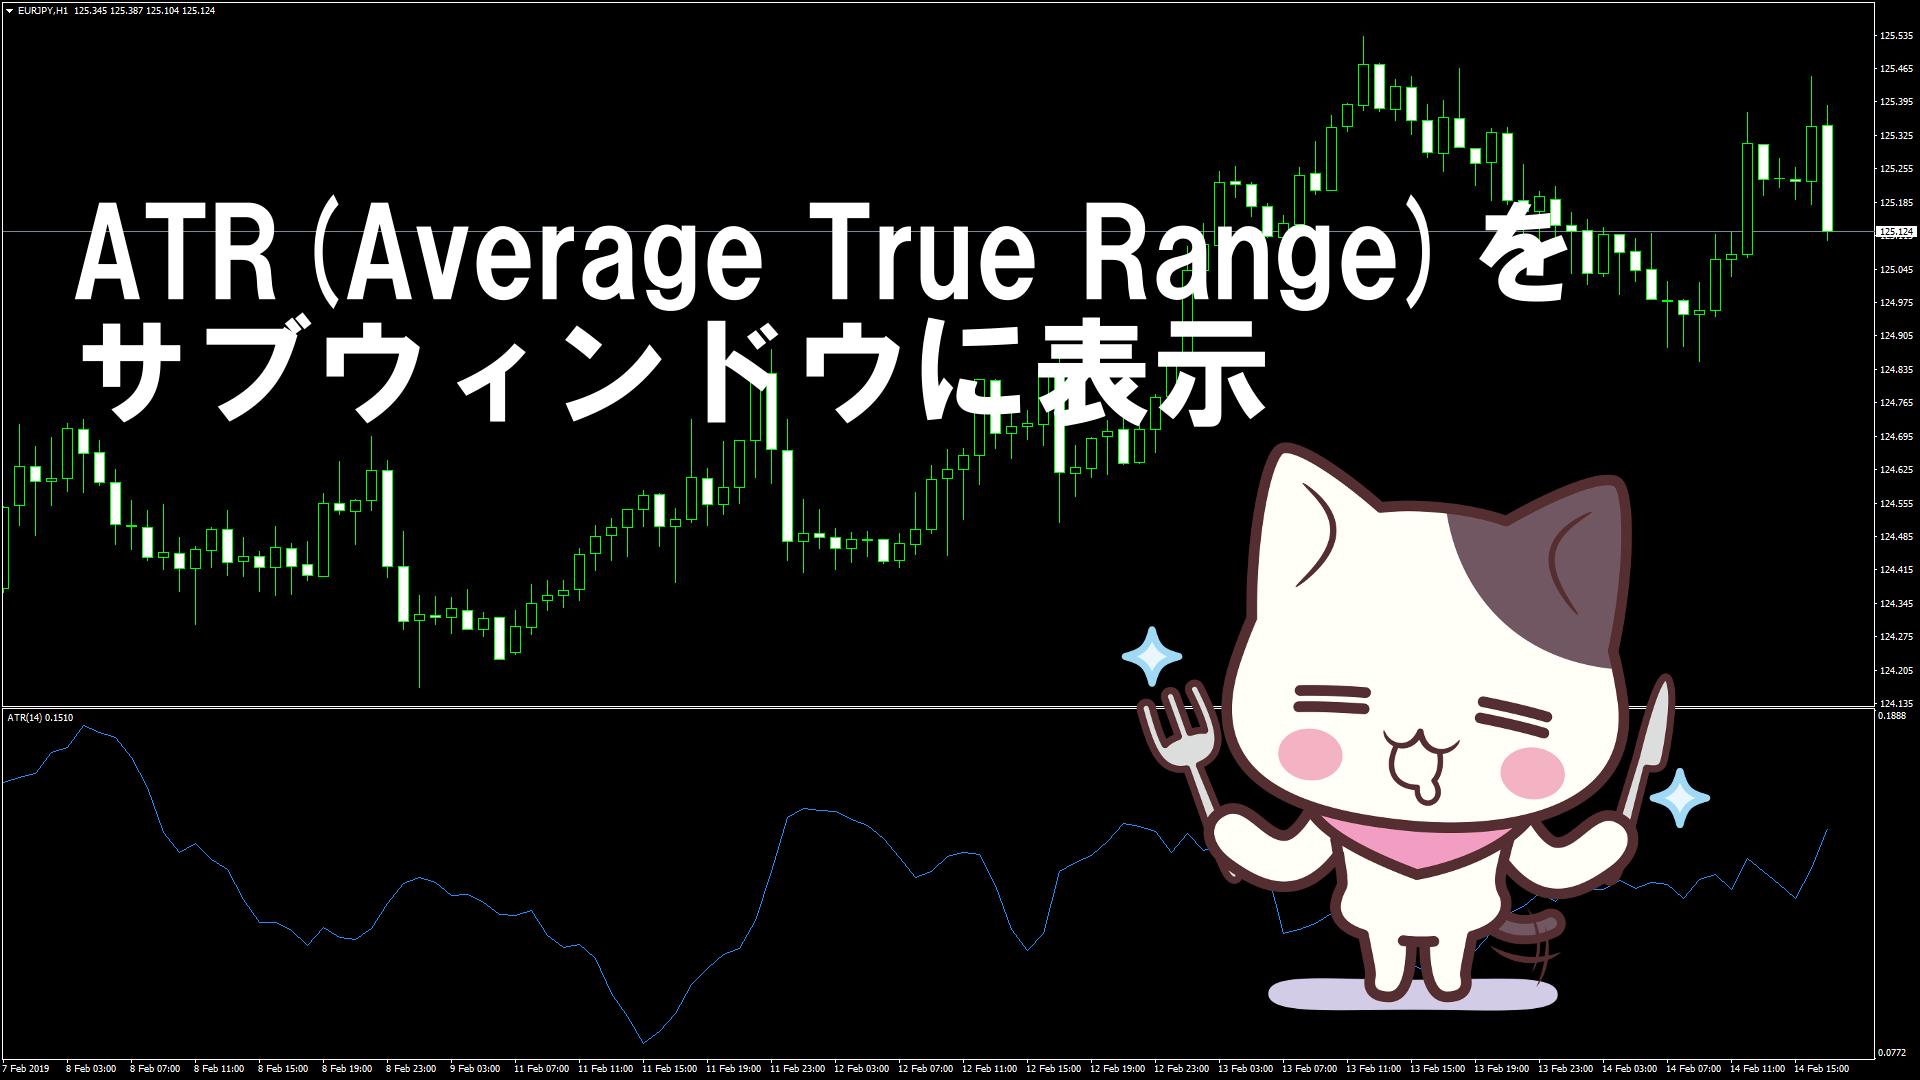 ATR(Average True Range)をサブウィンドウに表示するMT4インジケーター『ATR』